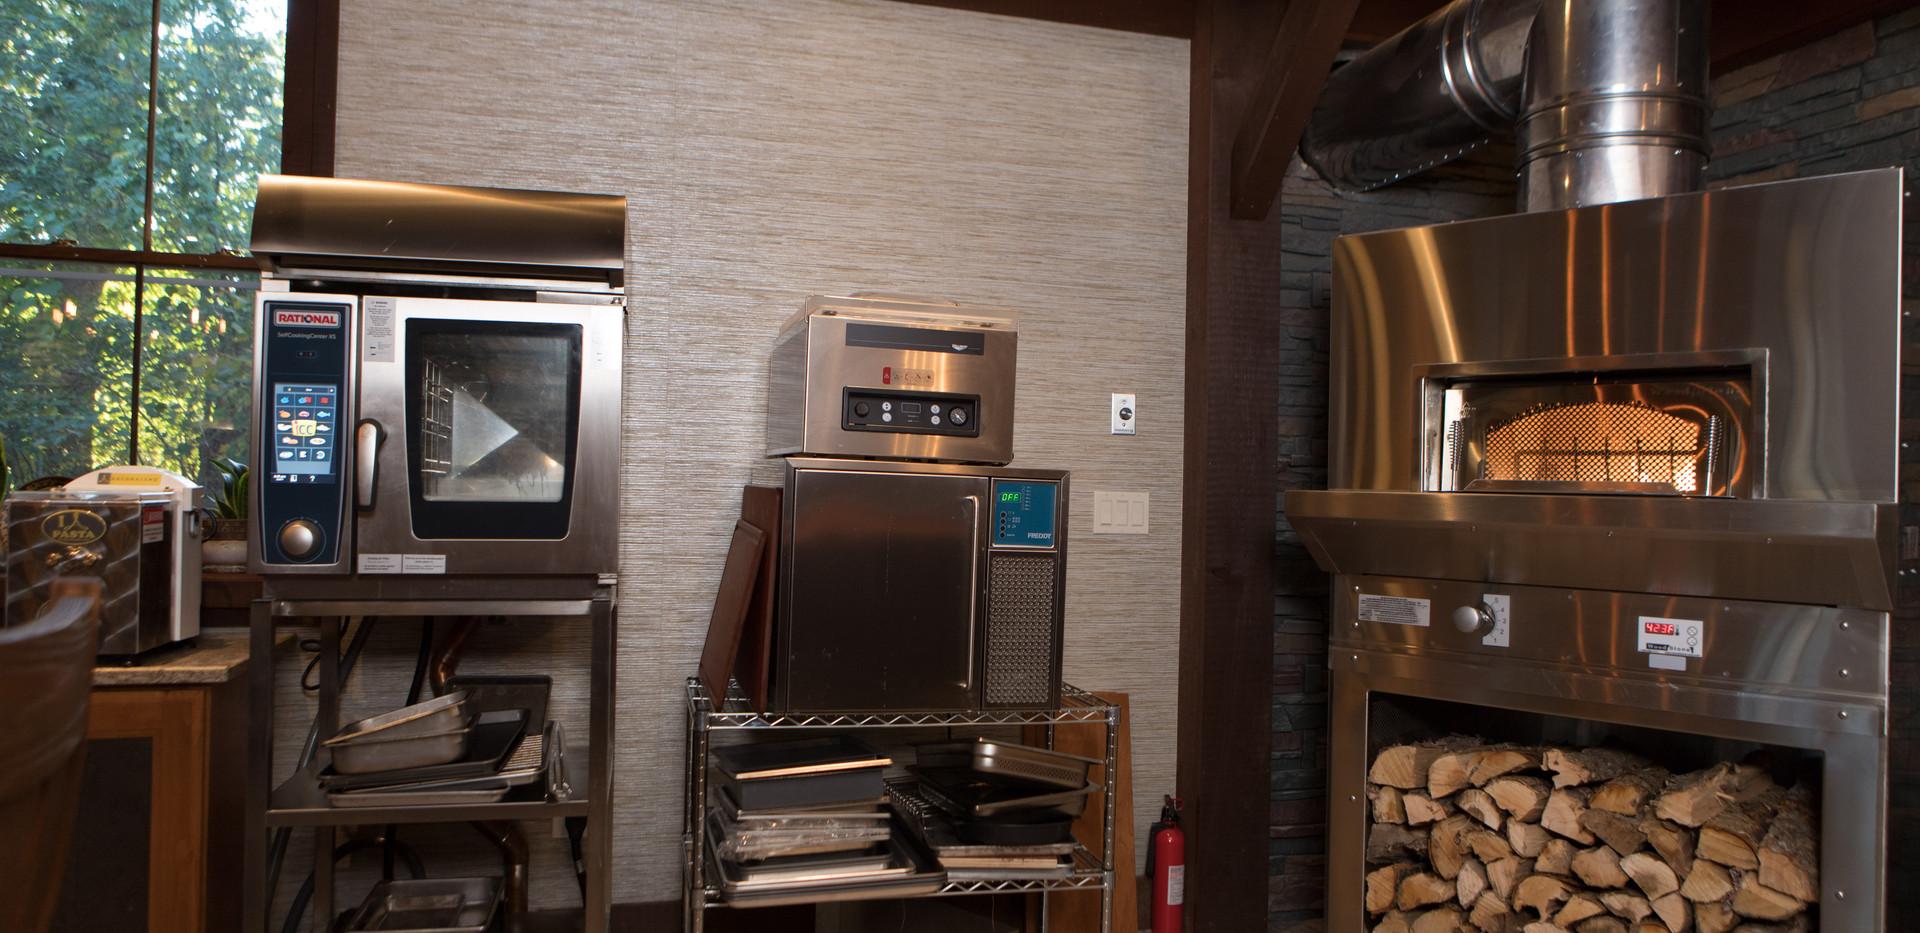 Rational Combi Oven & Wood Stone Oven